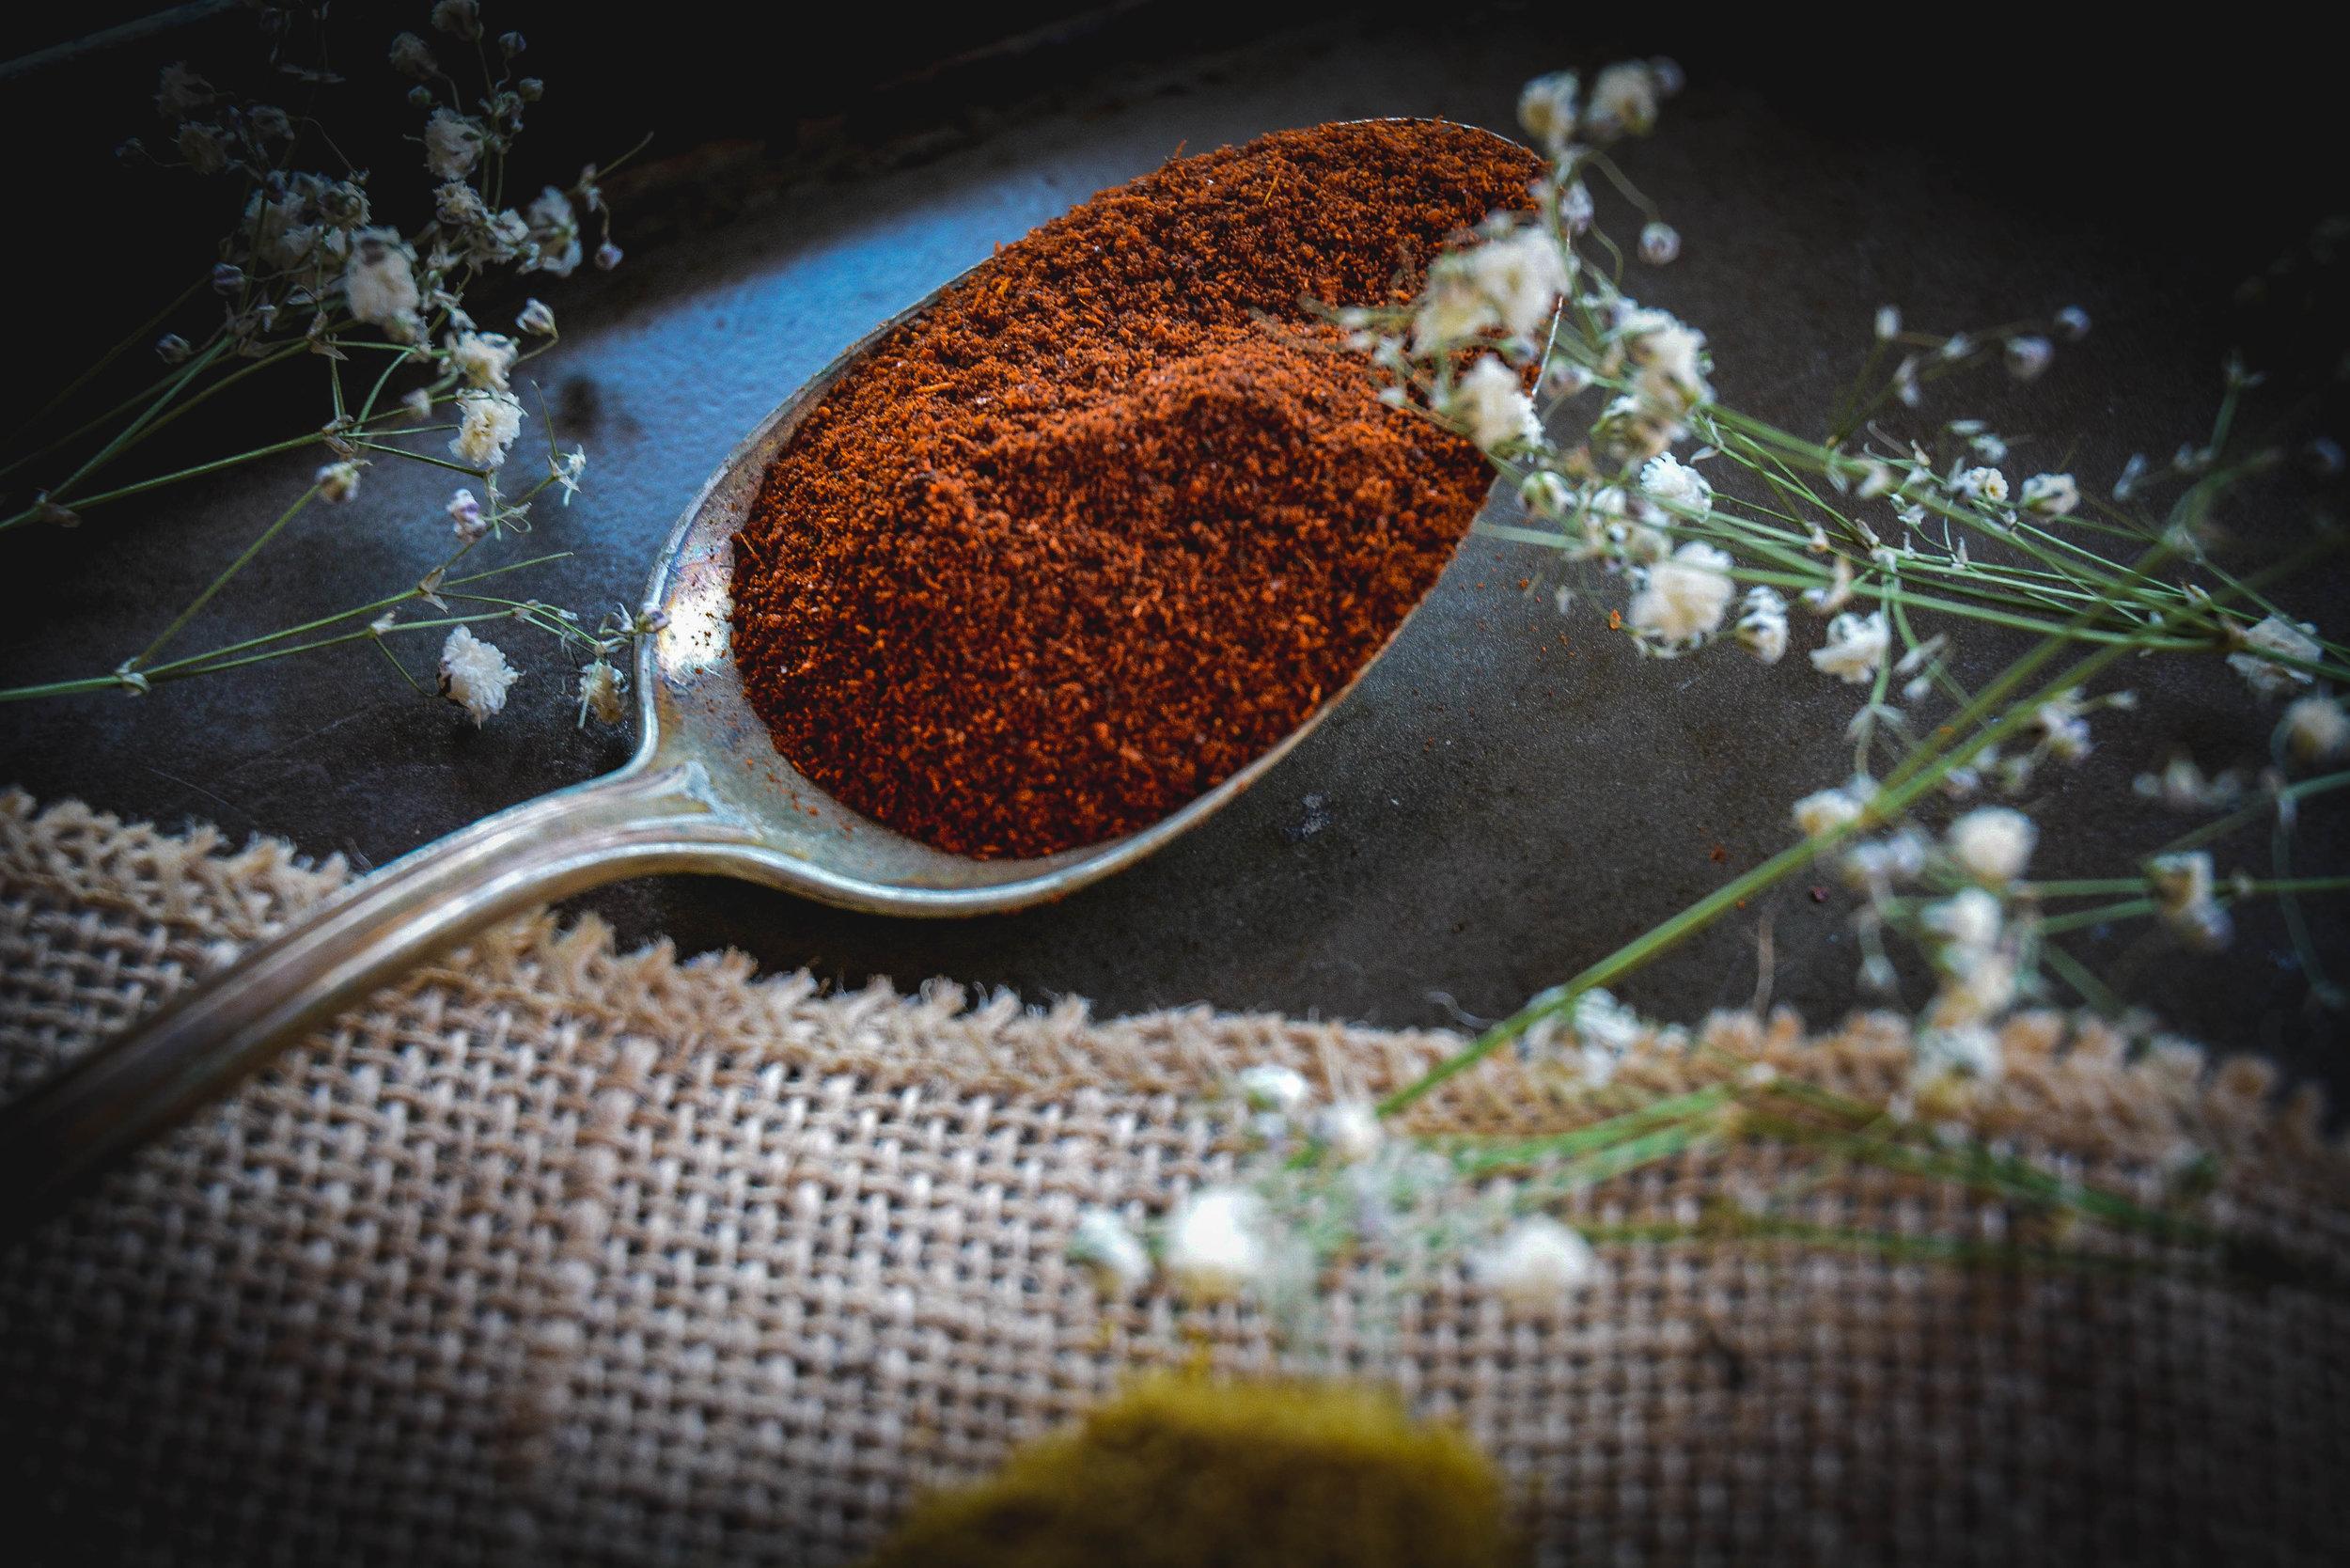 spoon and chili powder